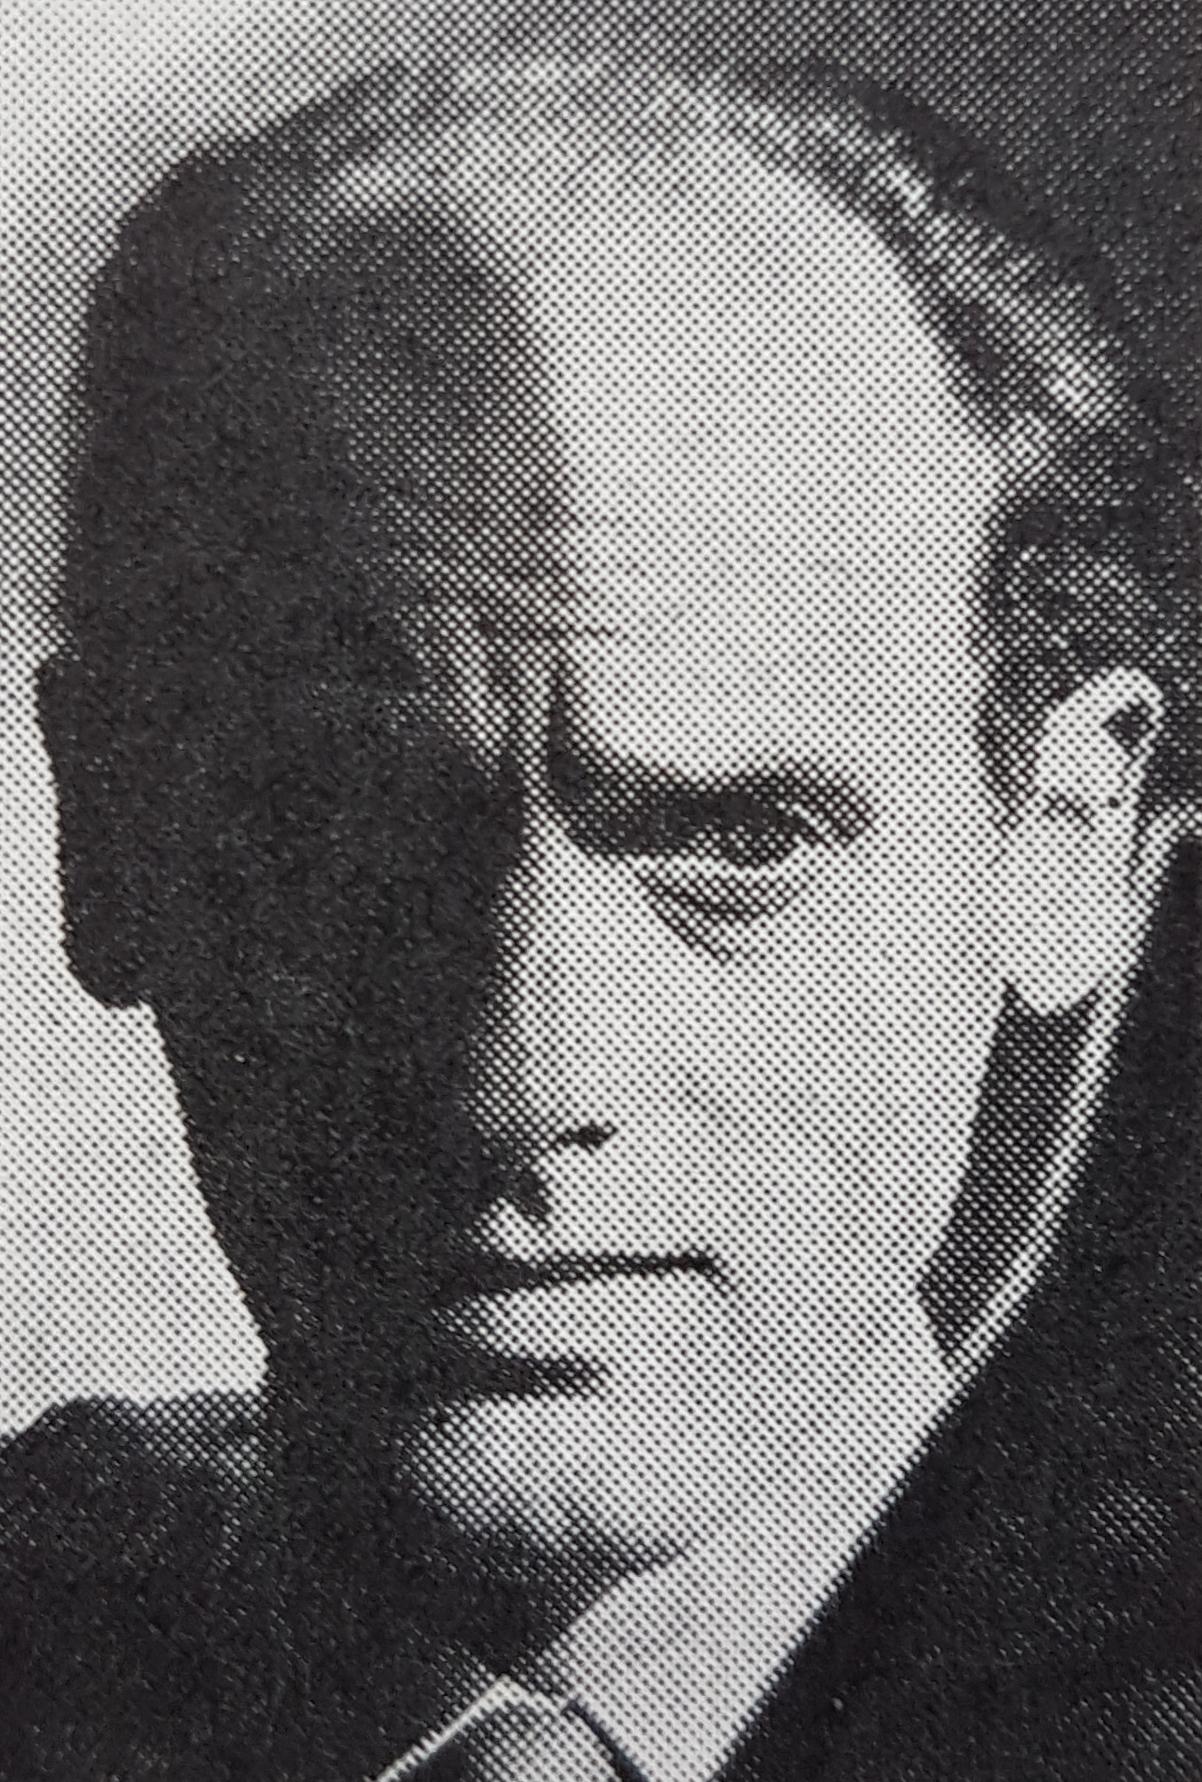 Foto Sigurd Persson, portret